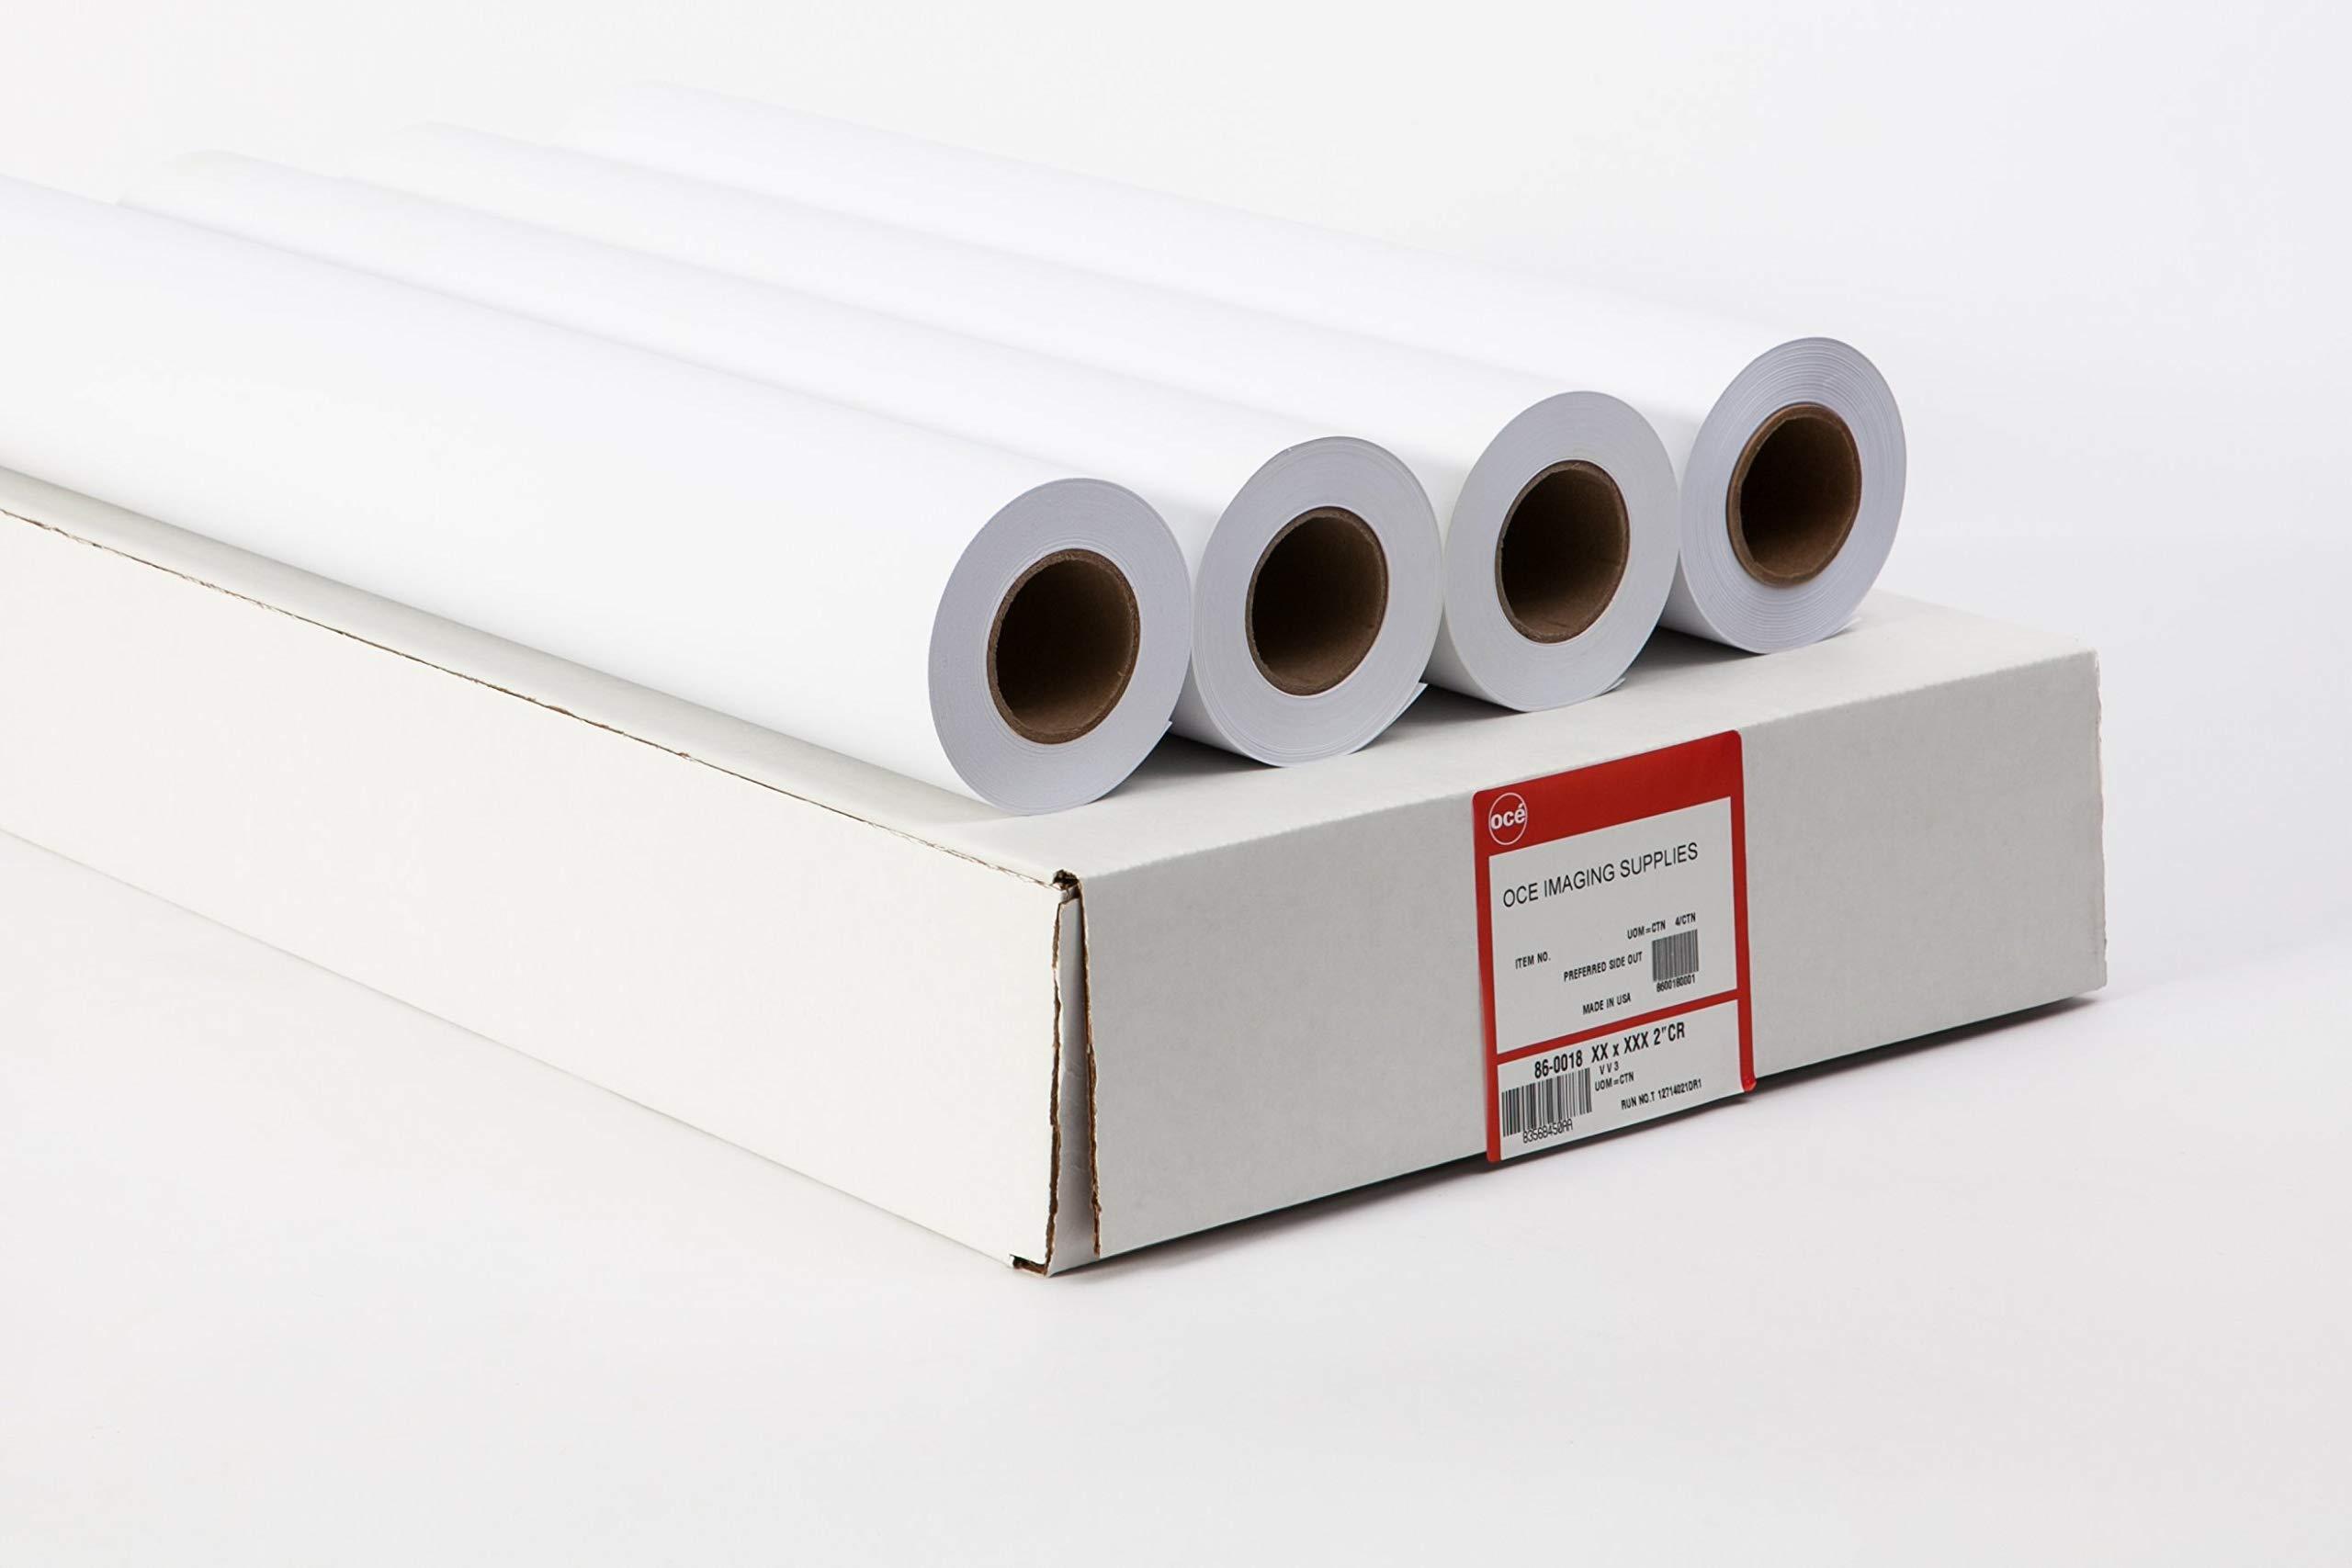 Oce 24# Inkjet Color - Water Resistant - 861024 Plotter Paper - 36'' x 150' (4 roll carton) by OCE